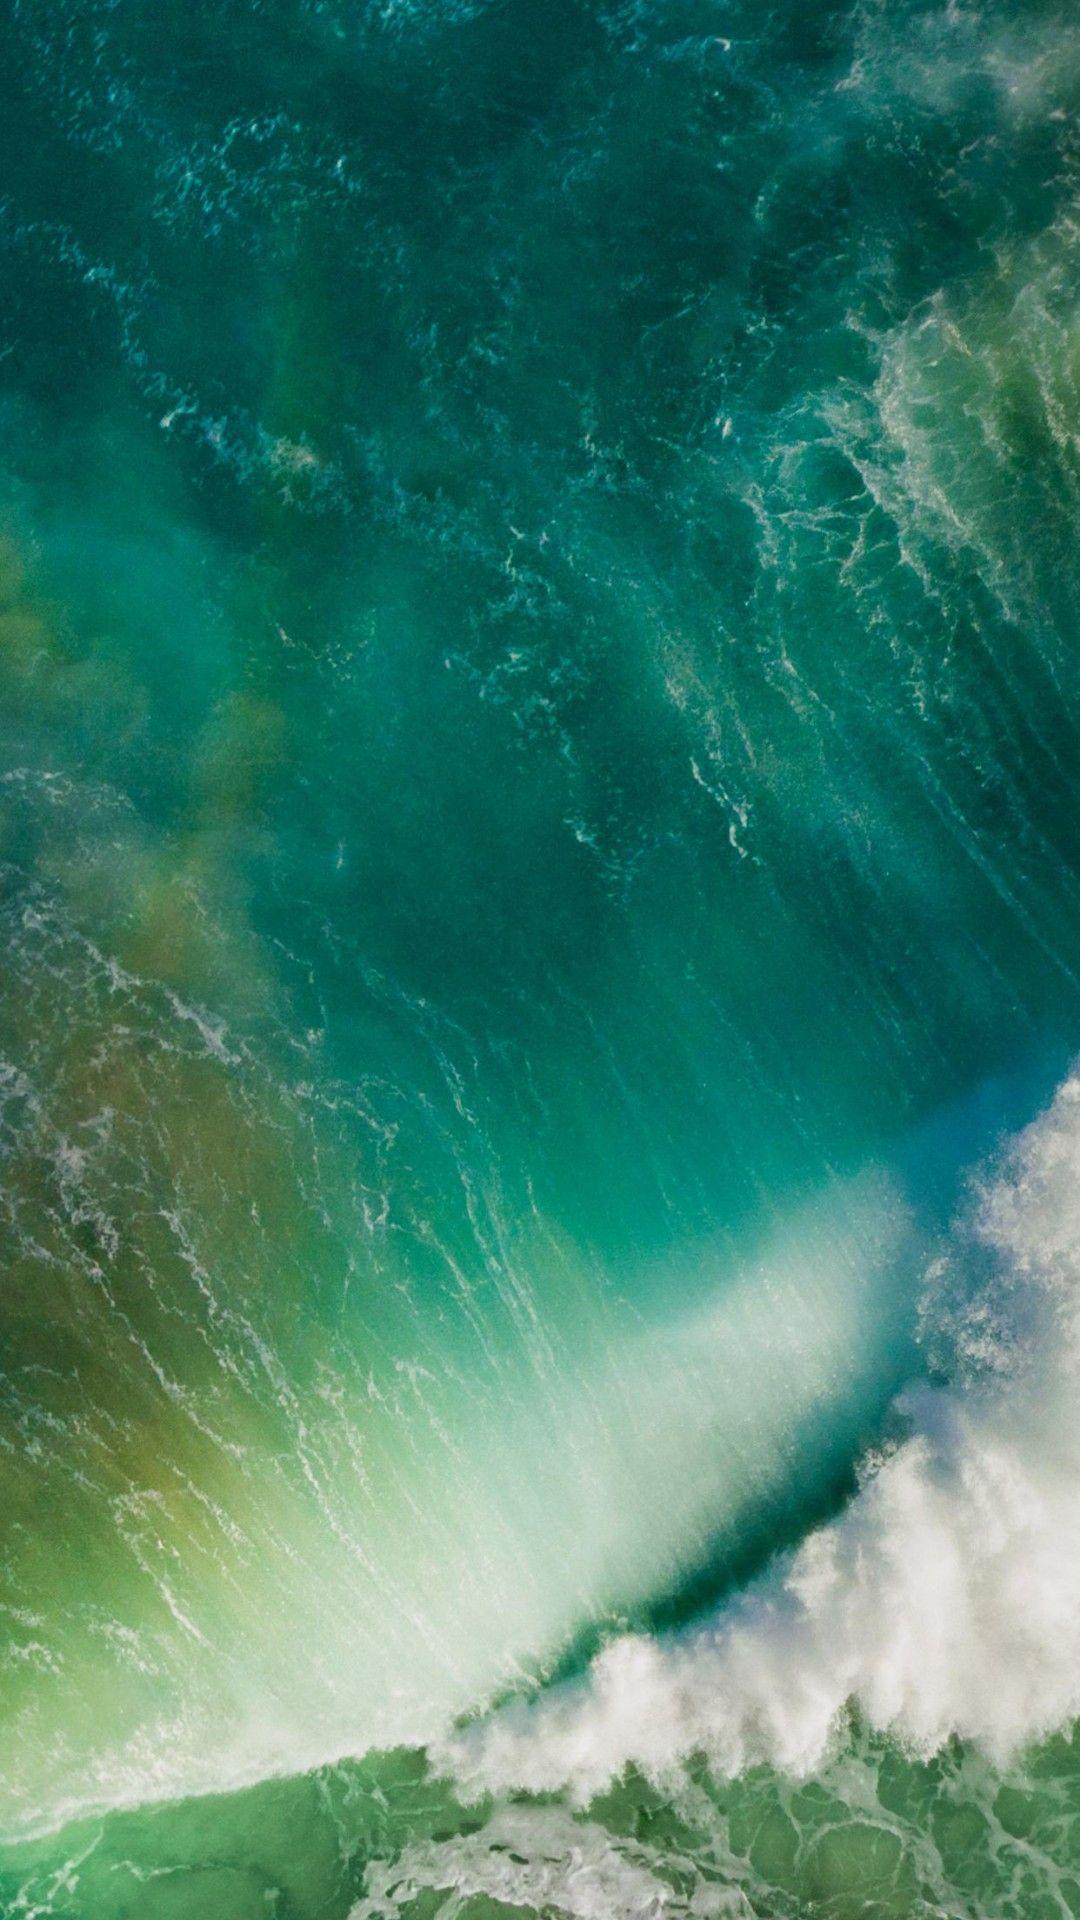 iOS 10 Splashing Wave Default iPhone 6 HD Wallpaper wallpapers 1080x1920